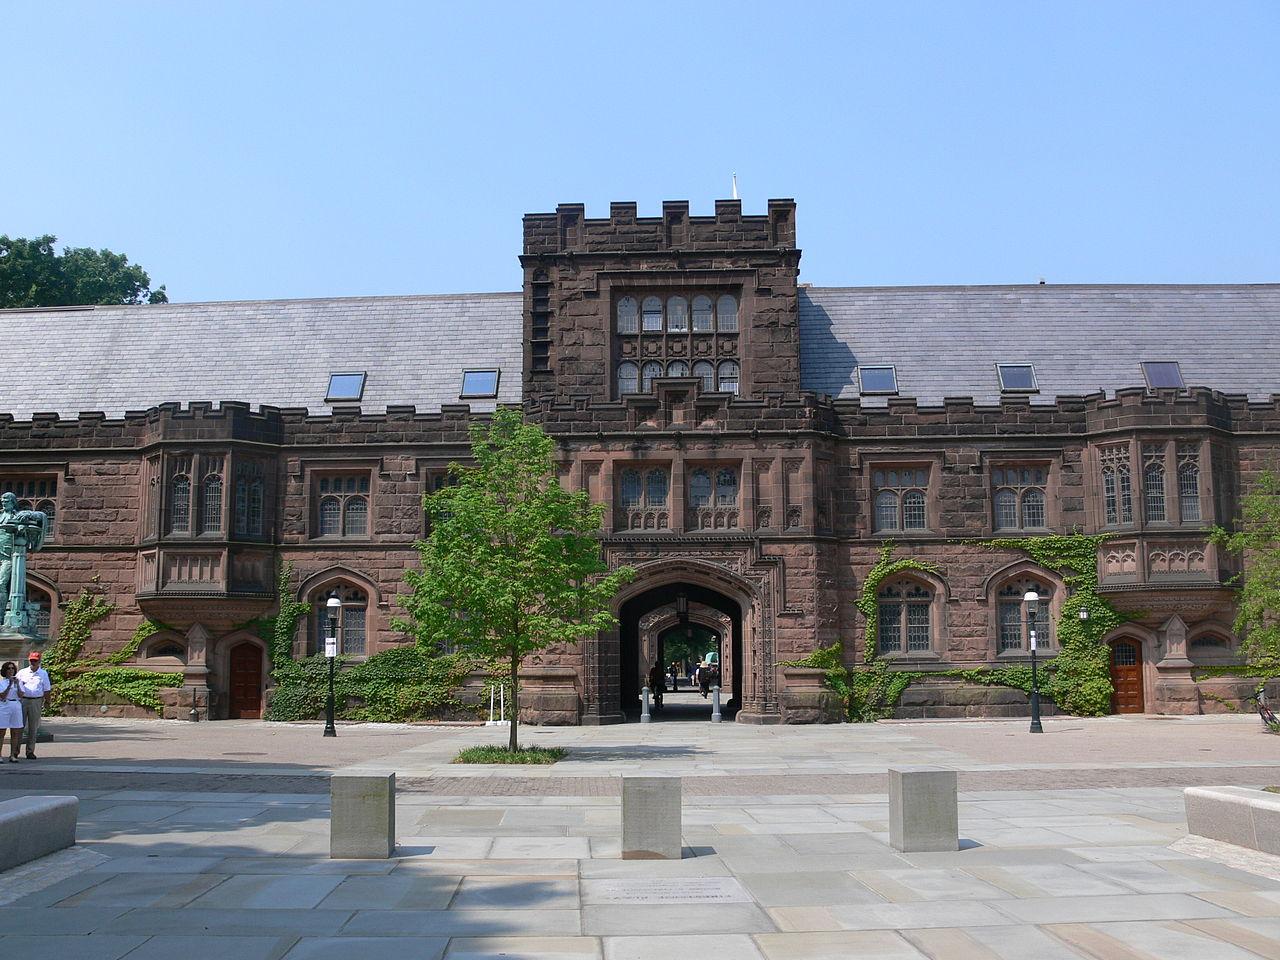 East Pyne Hall, Princeton University. Photo by Andreas Praefcke, Wikimedia Commons